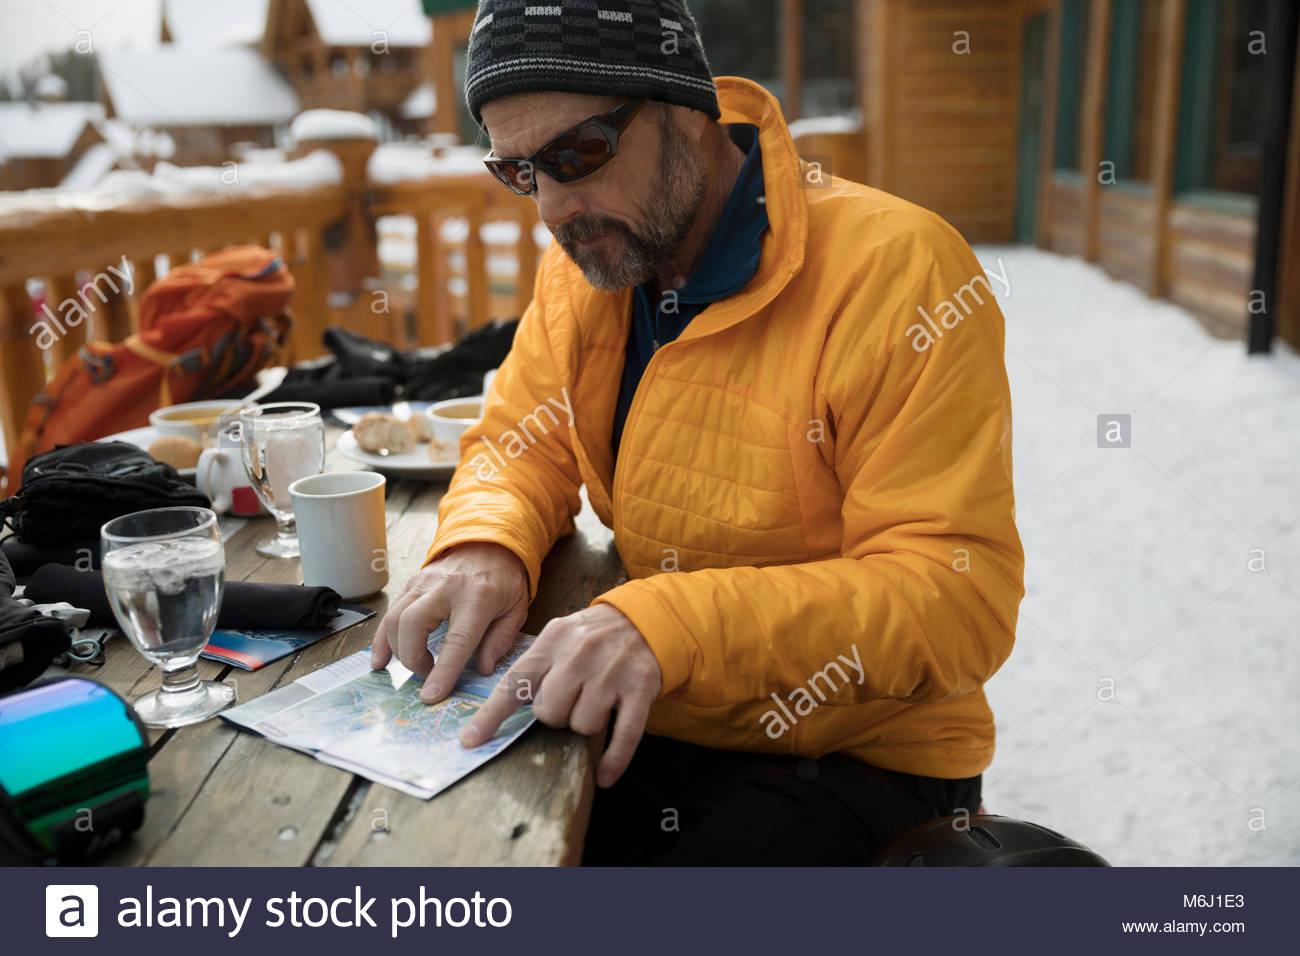 Male skier enjoying breakfast, preparing with map on snowy ski resort balcony Stock Photo